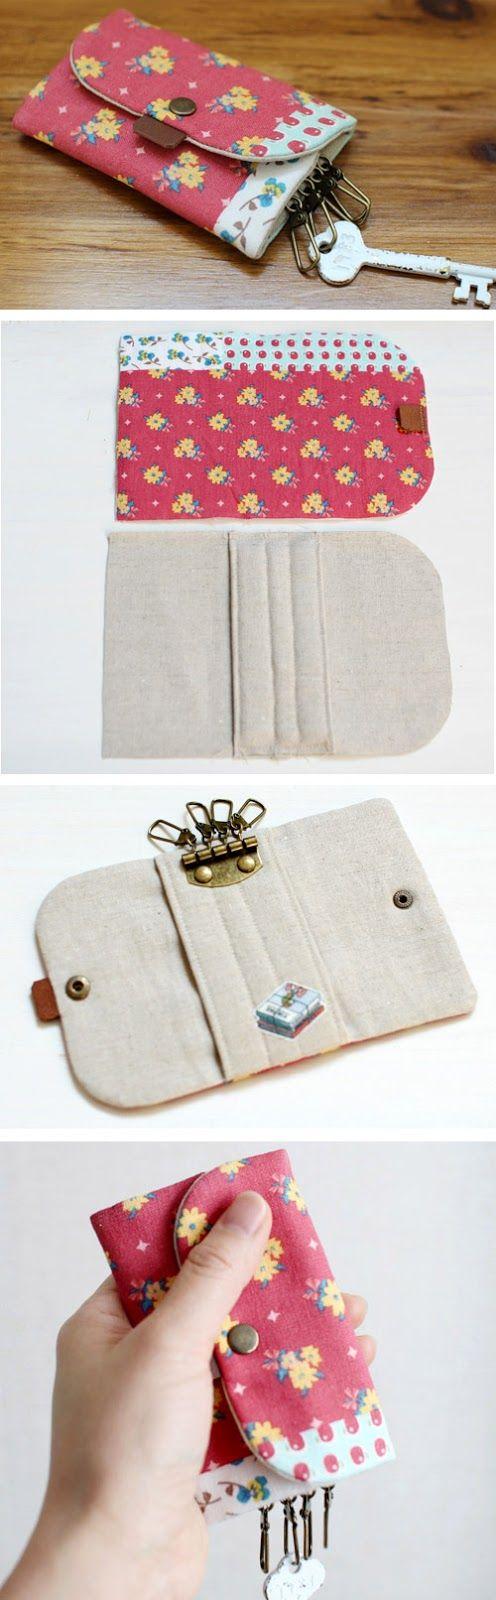 DIY Convenient keychain key holder. How to sew fabric. Tutorial in Pictures.   http://www.handmadiya.com/2015/10/key-chain-bag-holder-tutorial.html